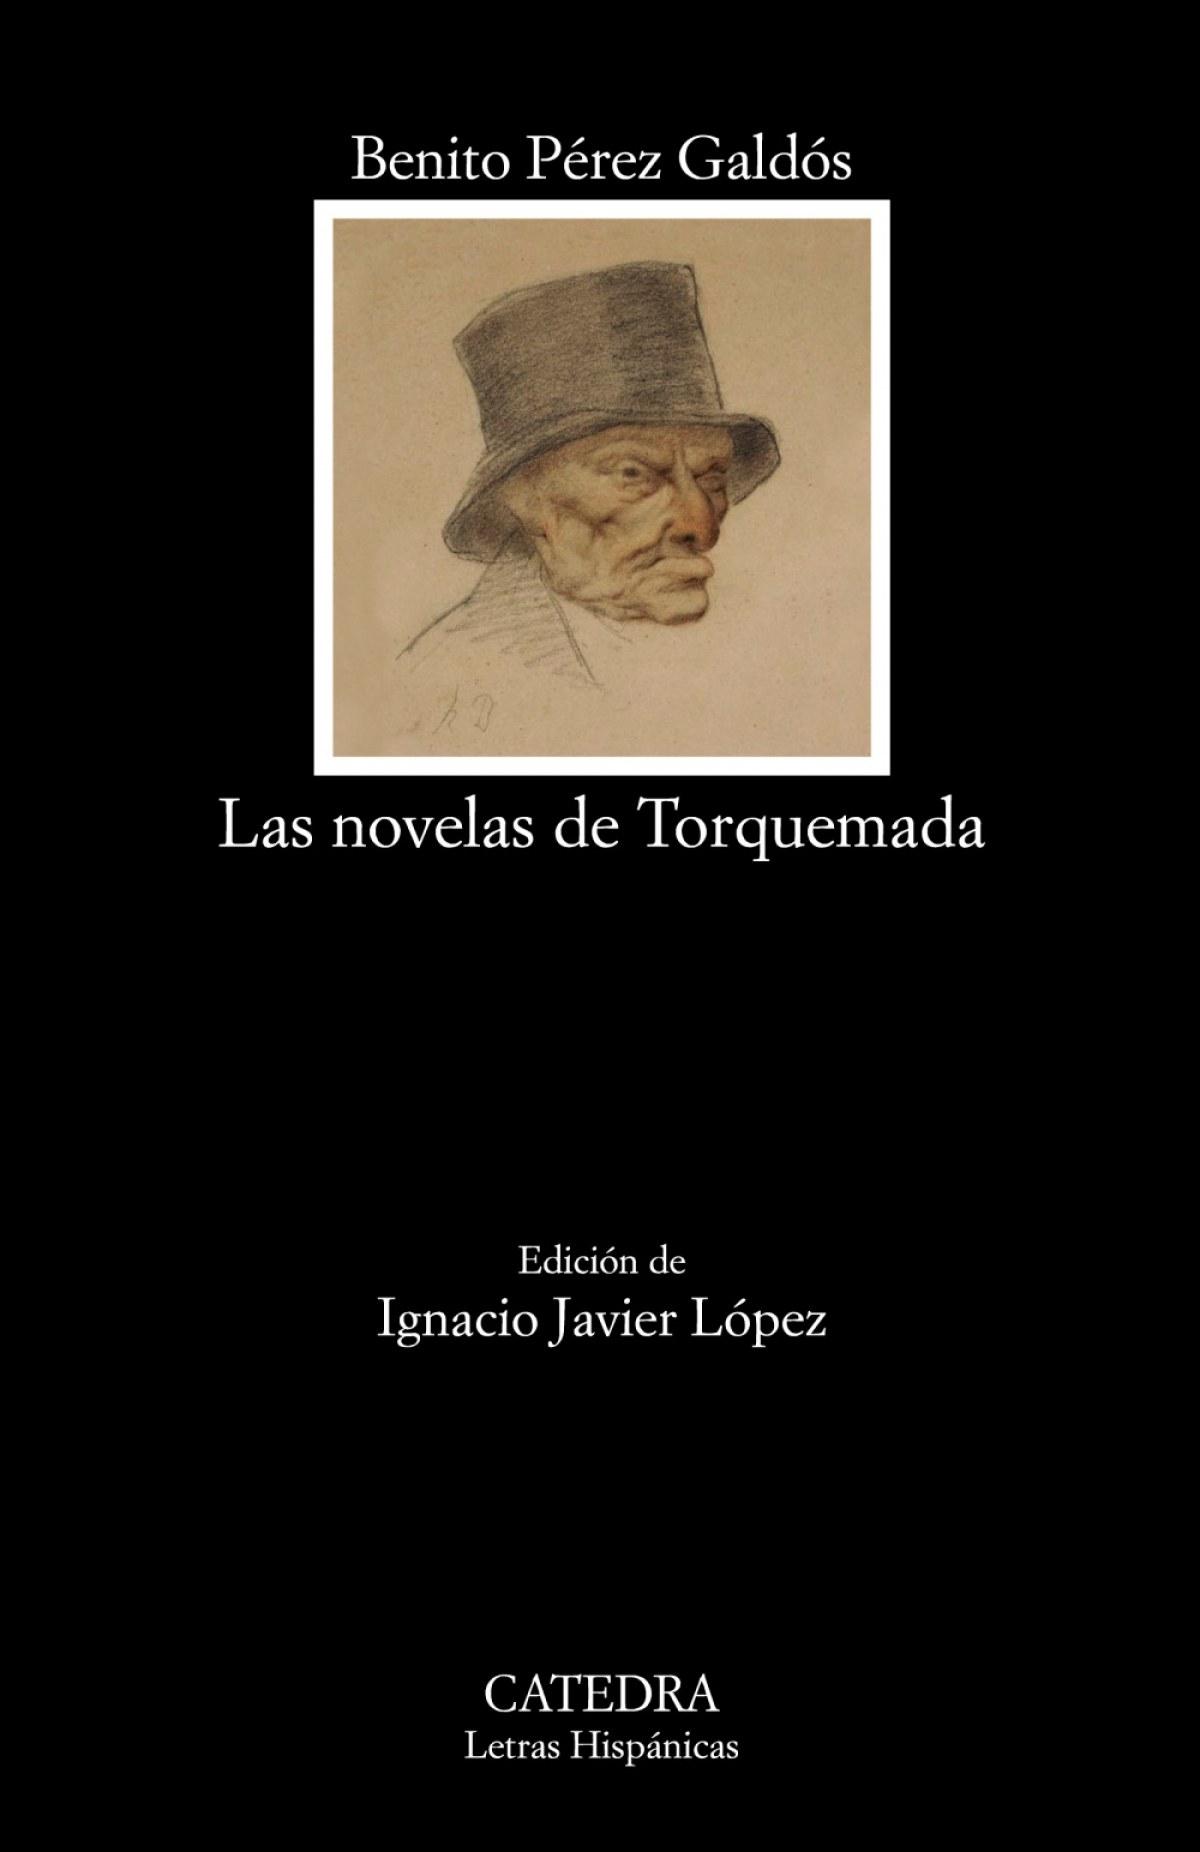 LAS NOVELAS DE TORQUEMADA 9788437639468